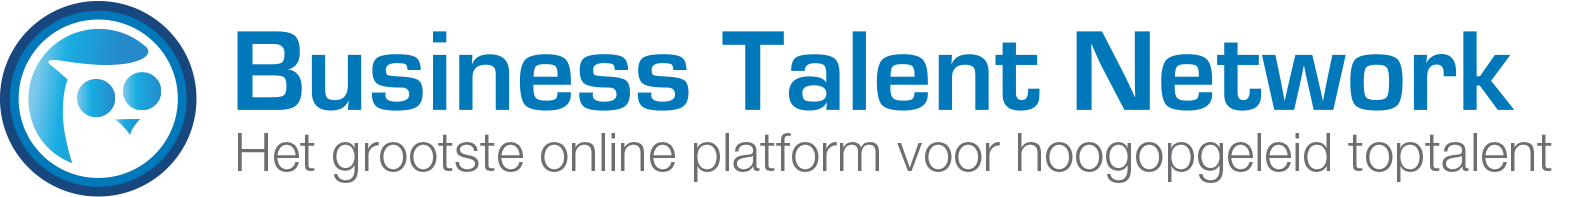 Logo-BusinessTalentNetwork